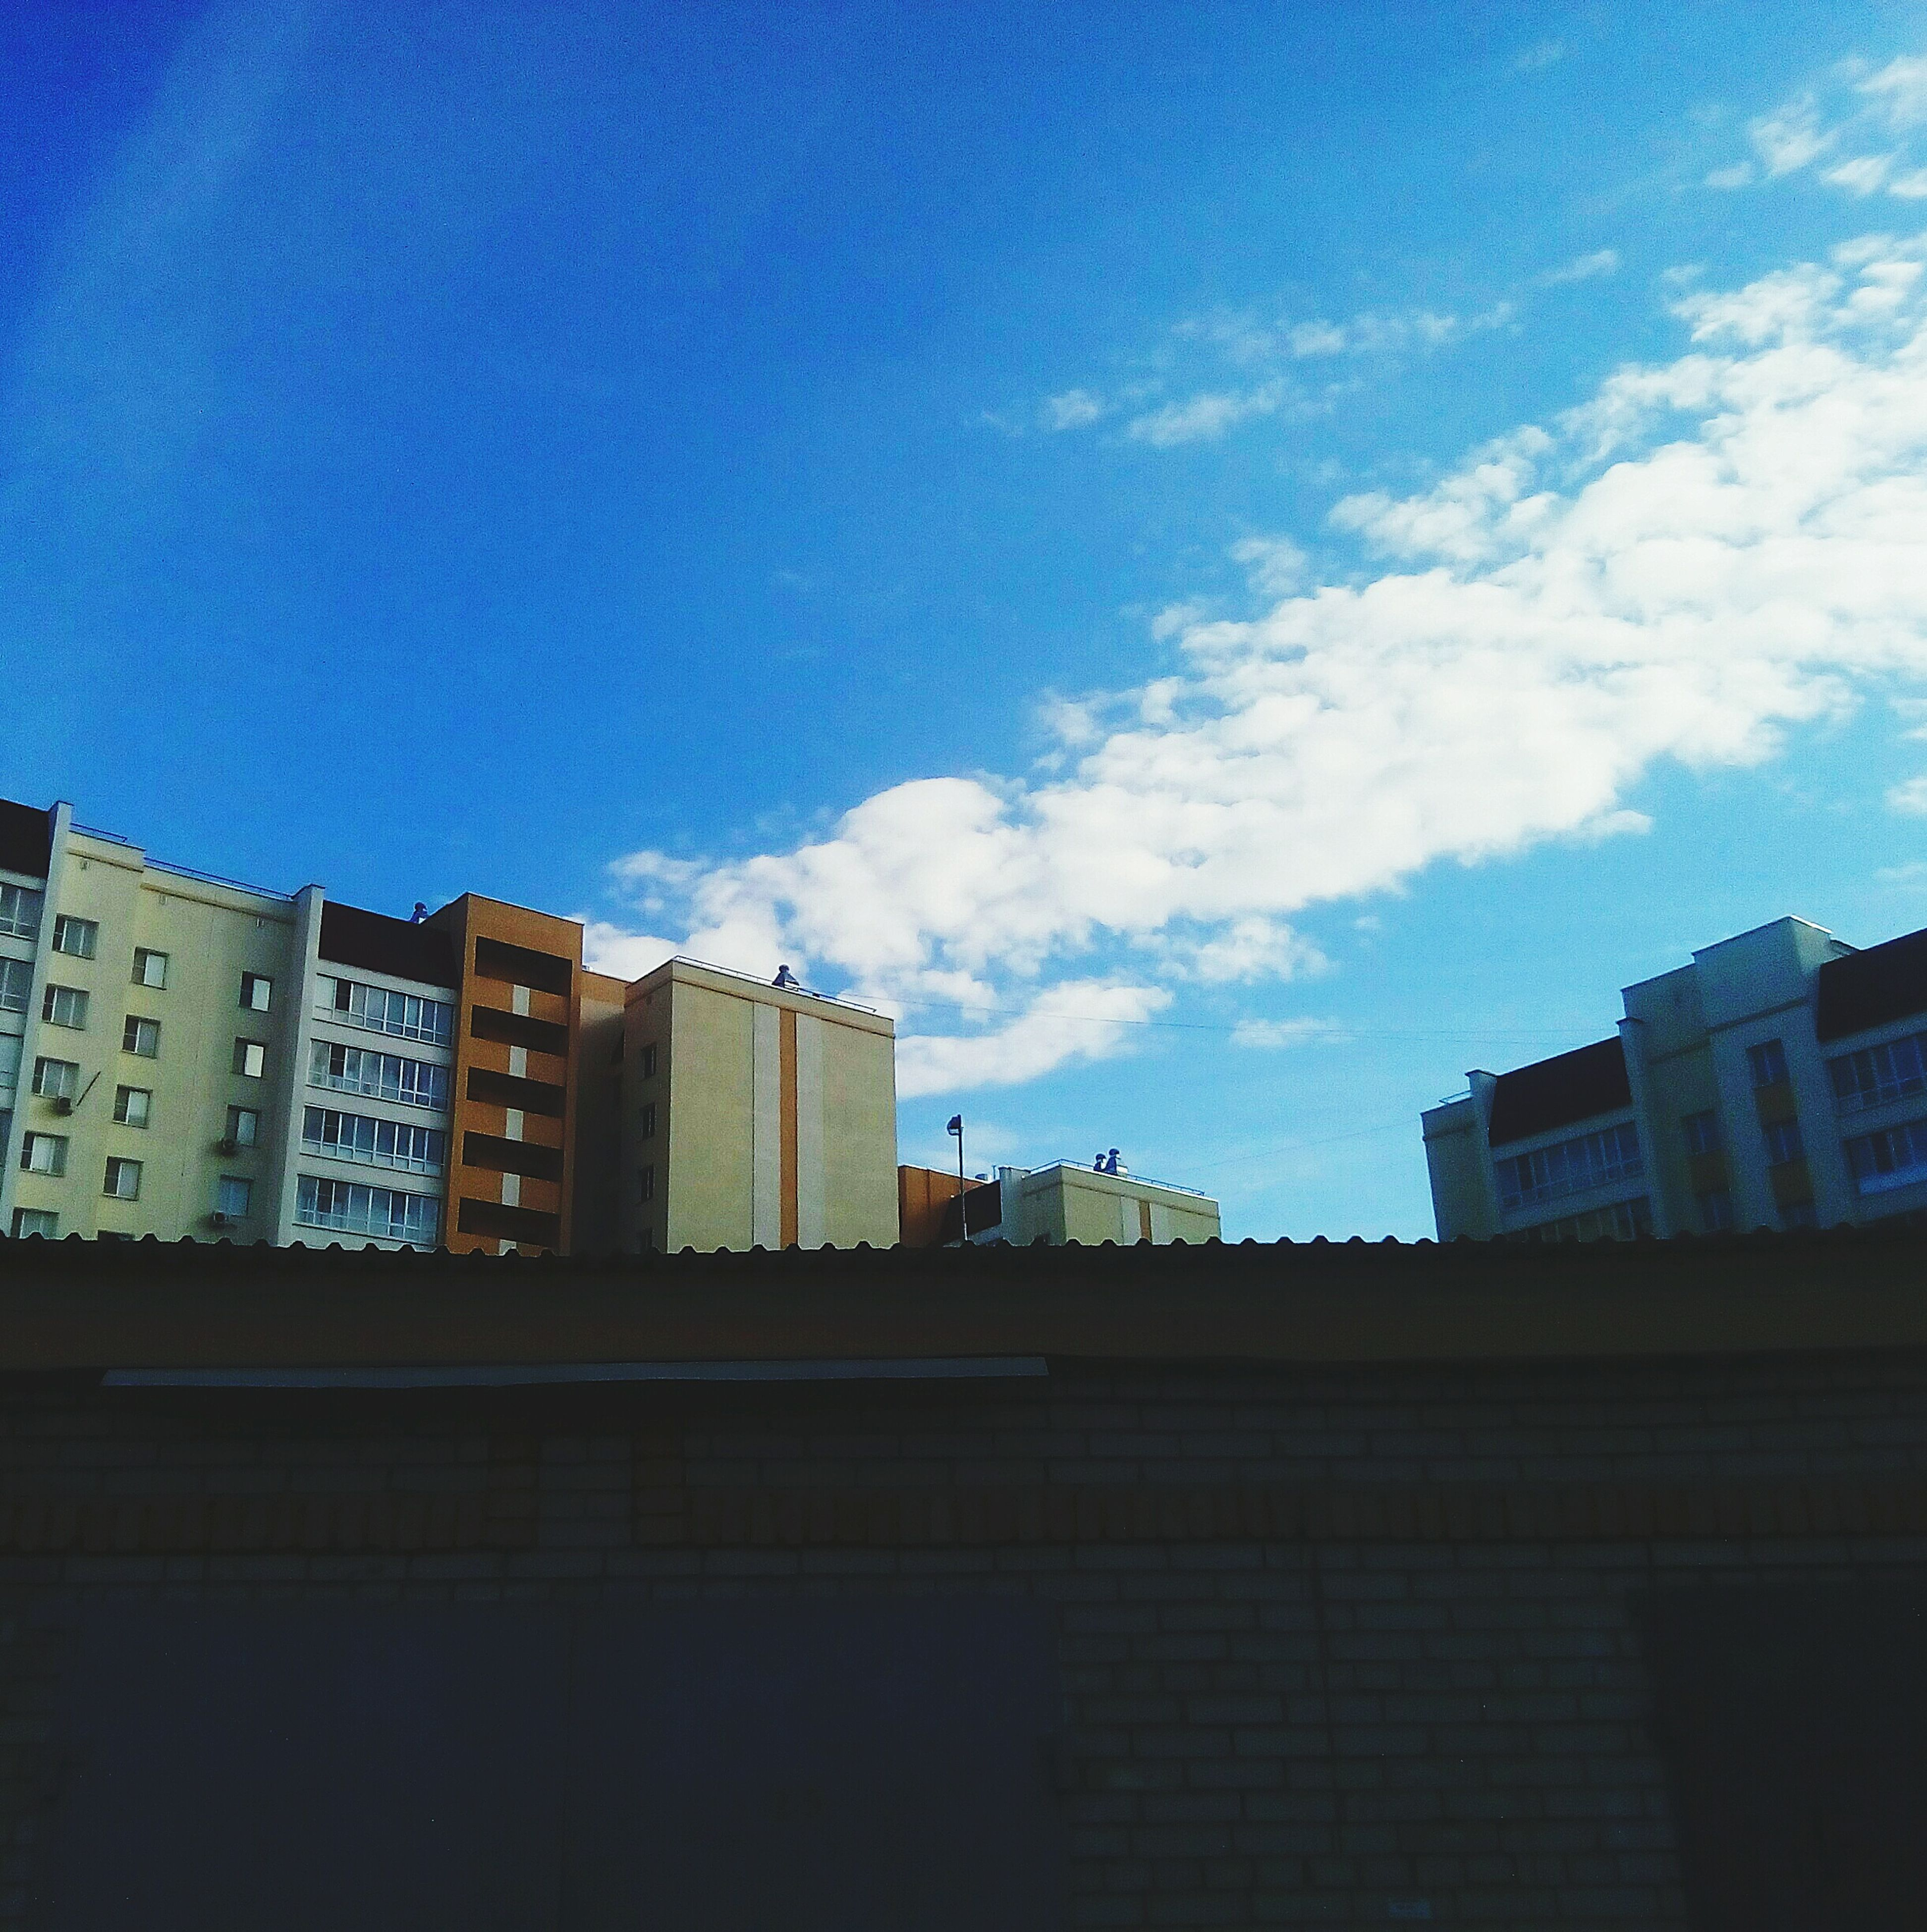 architecture, building exterior, built structure, sky, city, cloud, blue, day, cloud - sky, outdoors, city life, apartment, building story, urban skyline, cloudscape, no people, development, office building